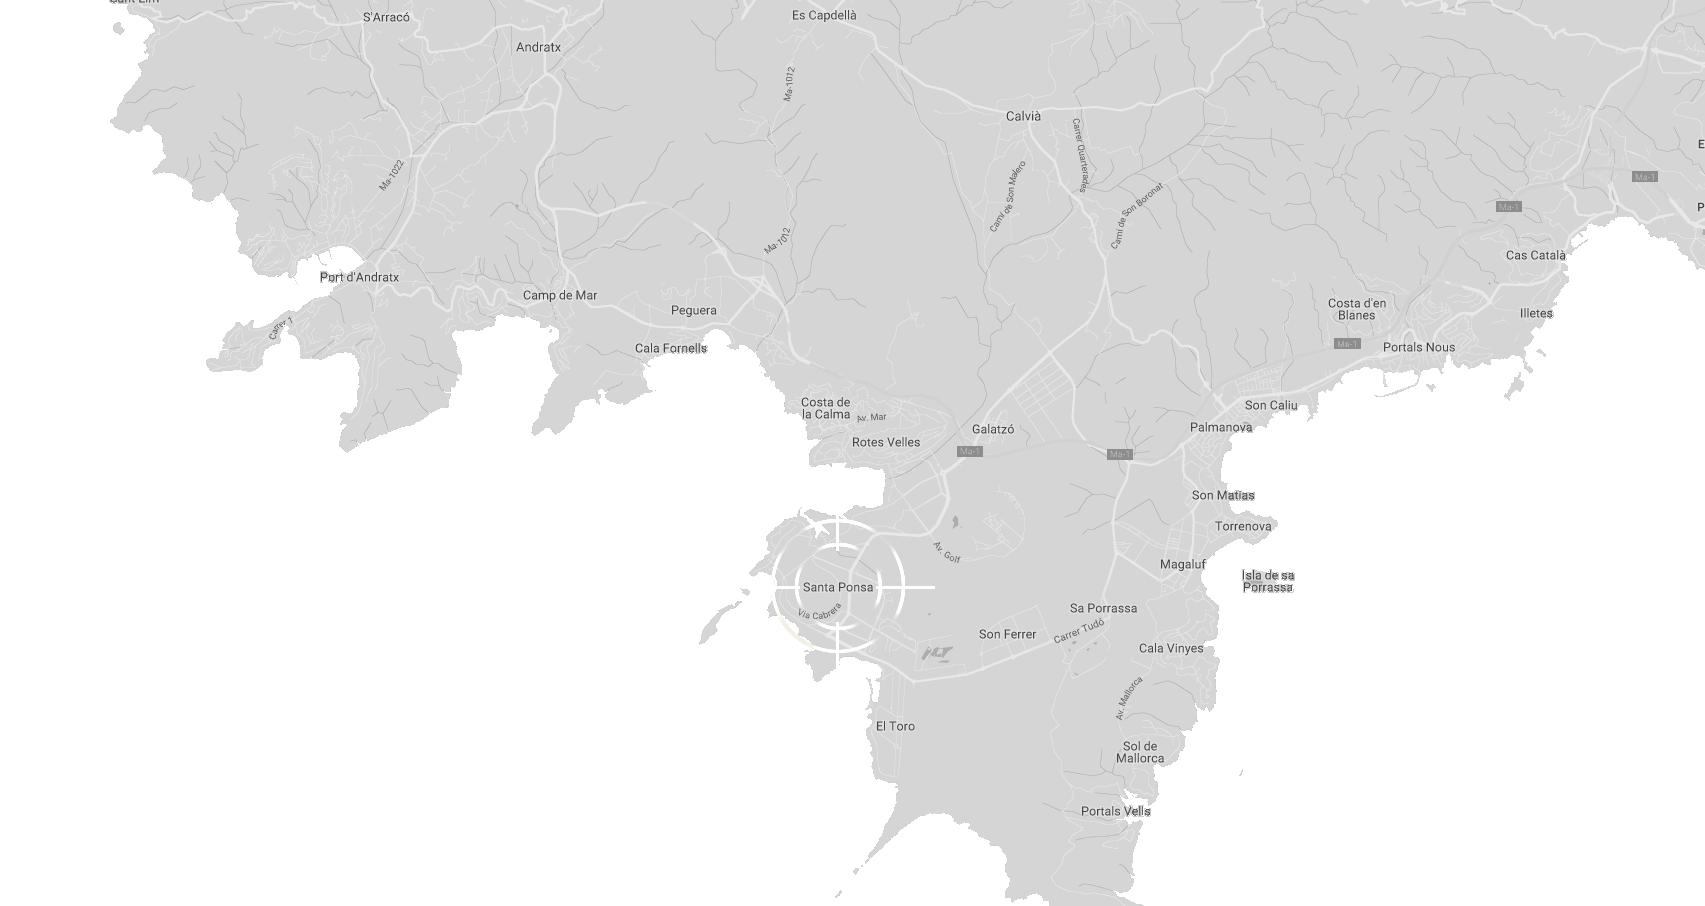 Santa Ponsa on map.